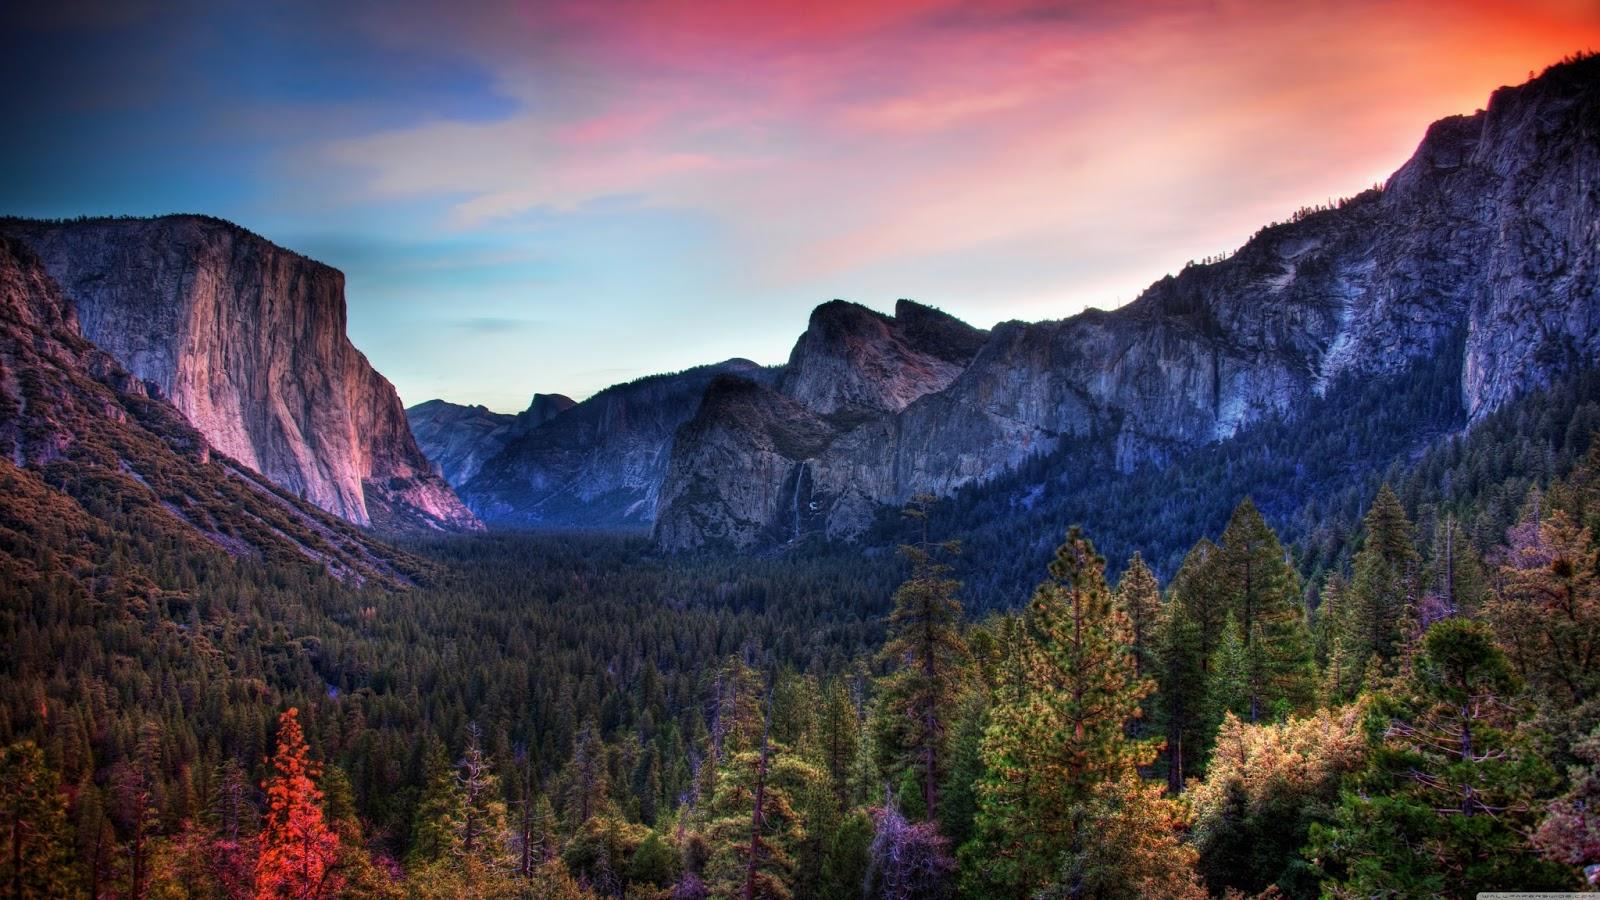 10 best imac 5k retina wallpapers 5k wallpapers for Wallpaper home 5k